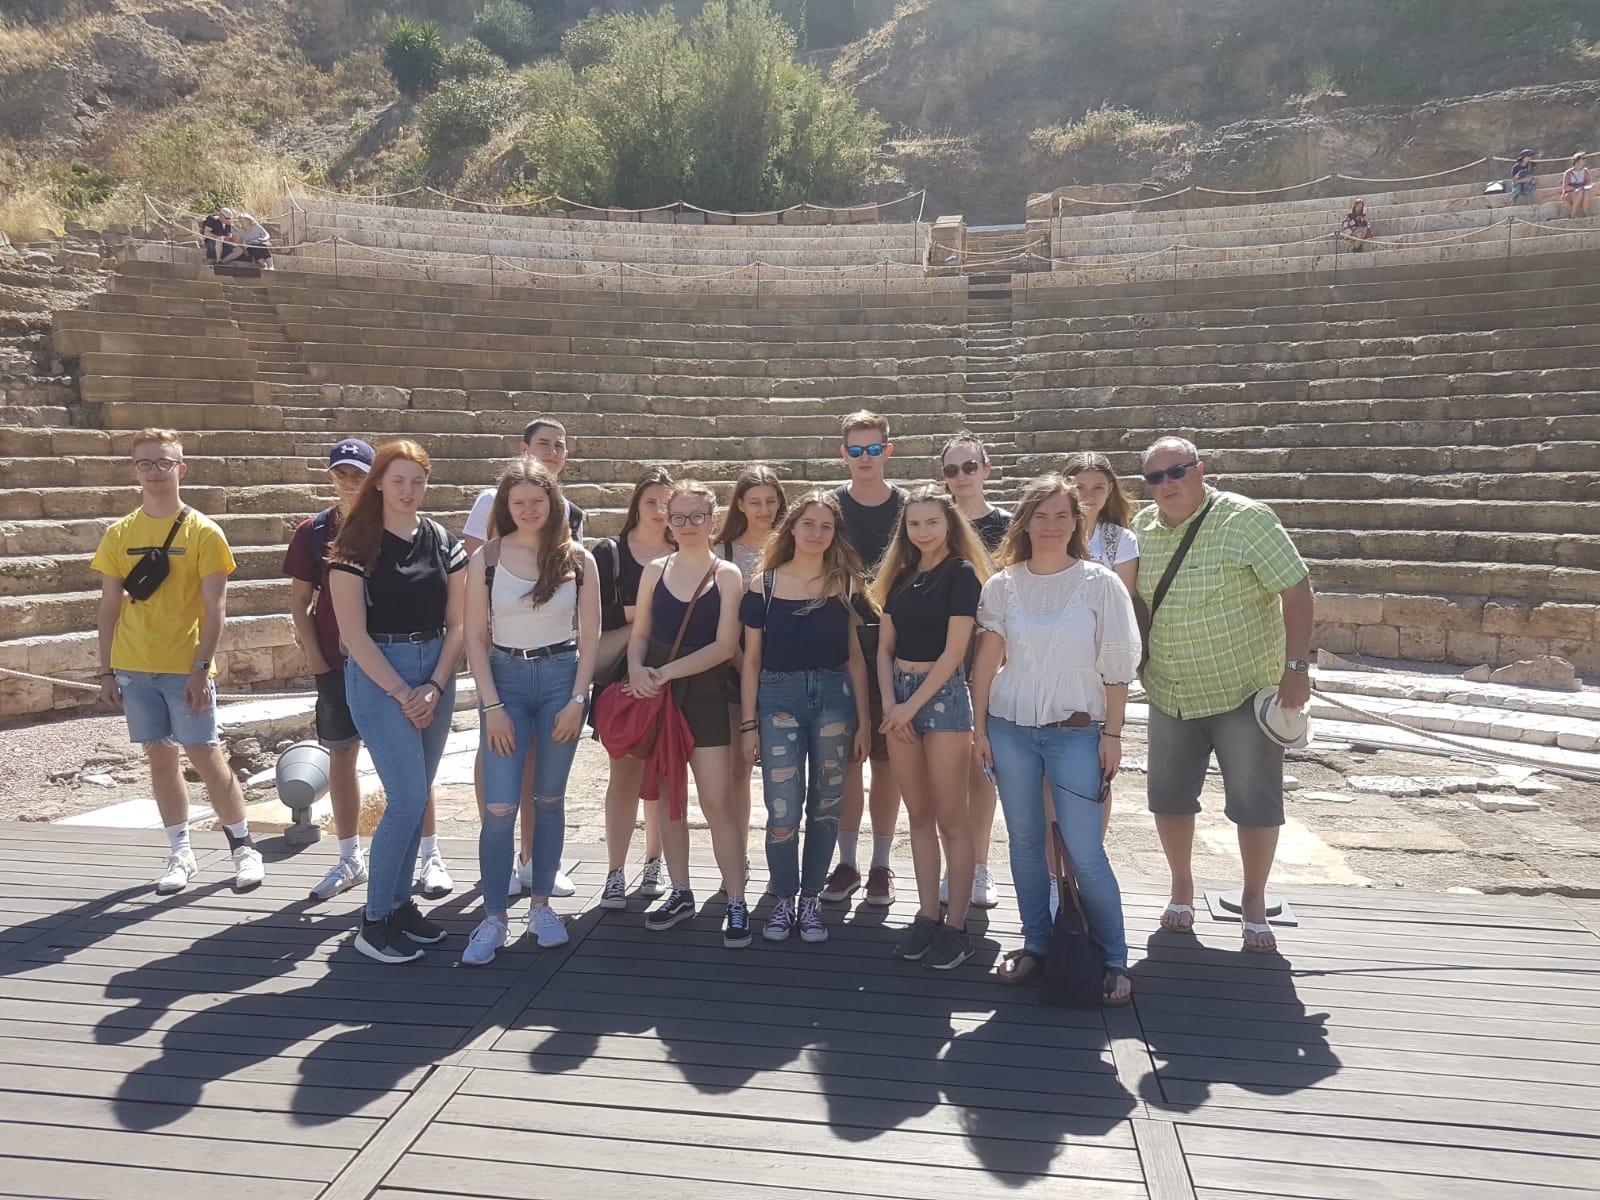 Schüleraustausch Spanien Bild 3